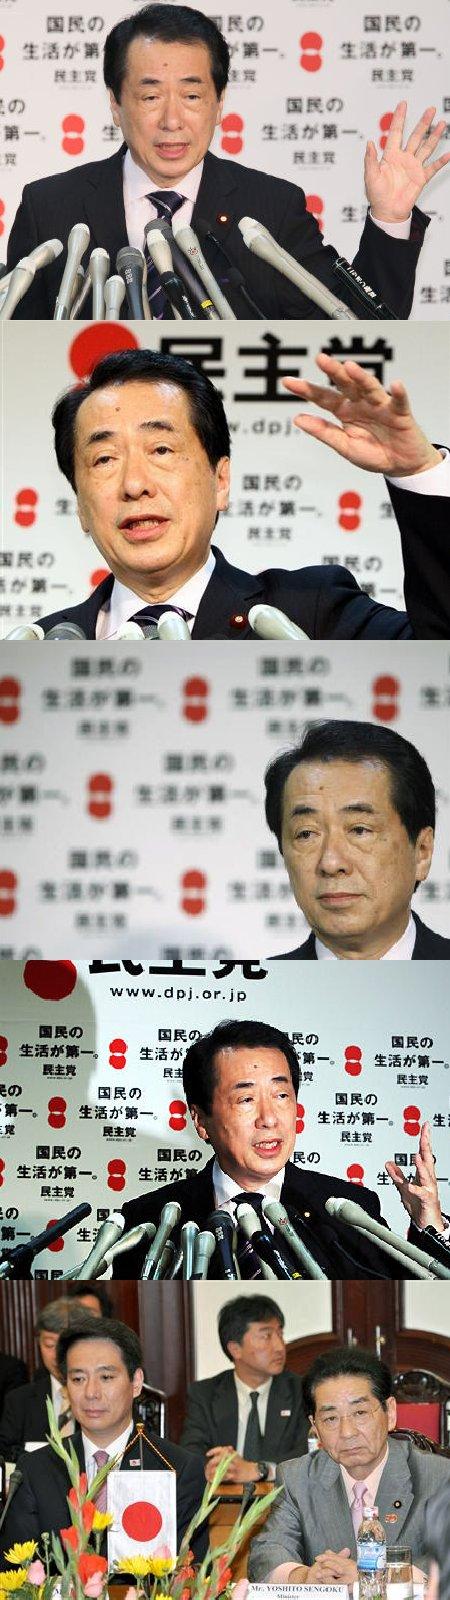 菅政権_z